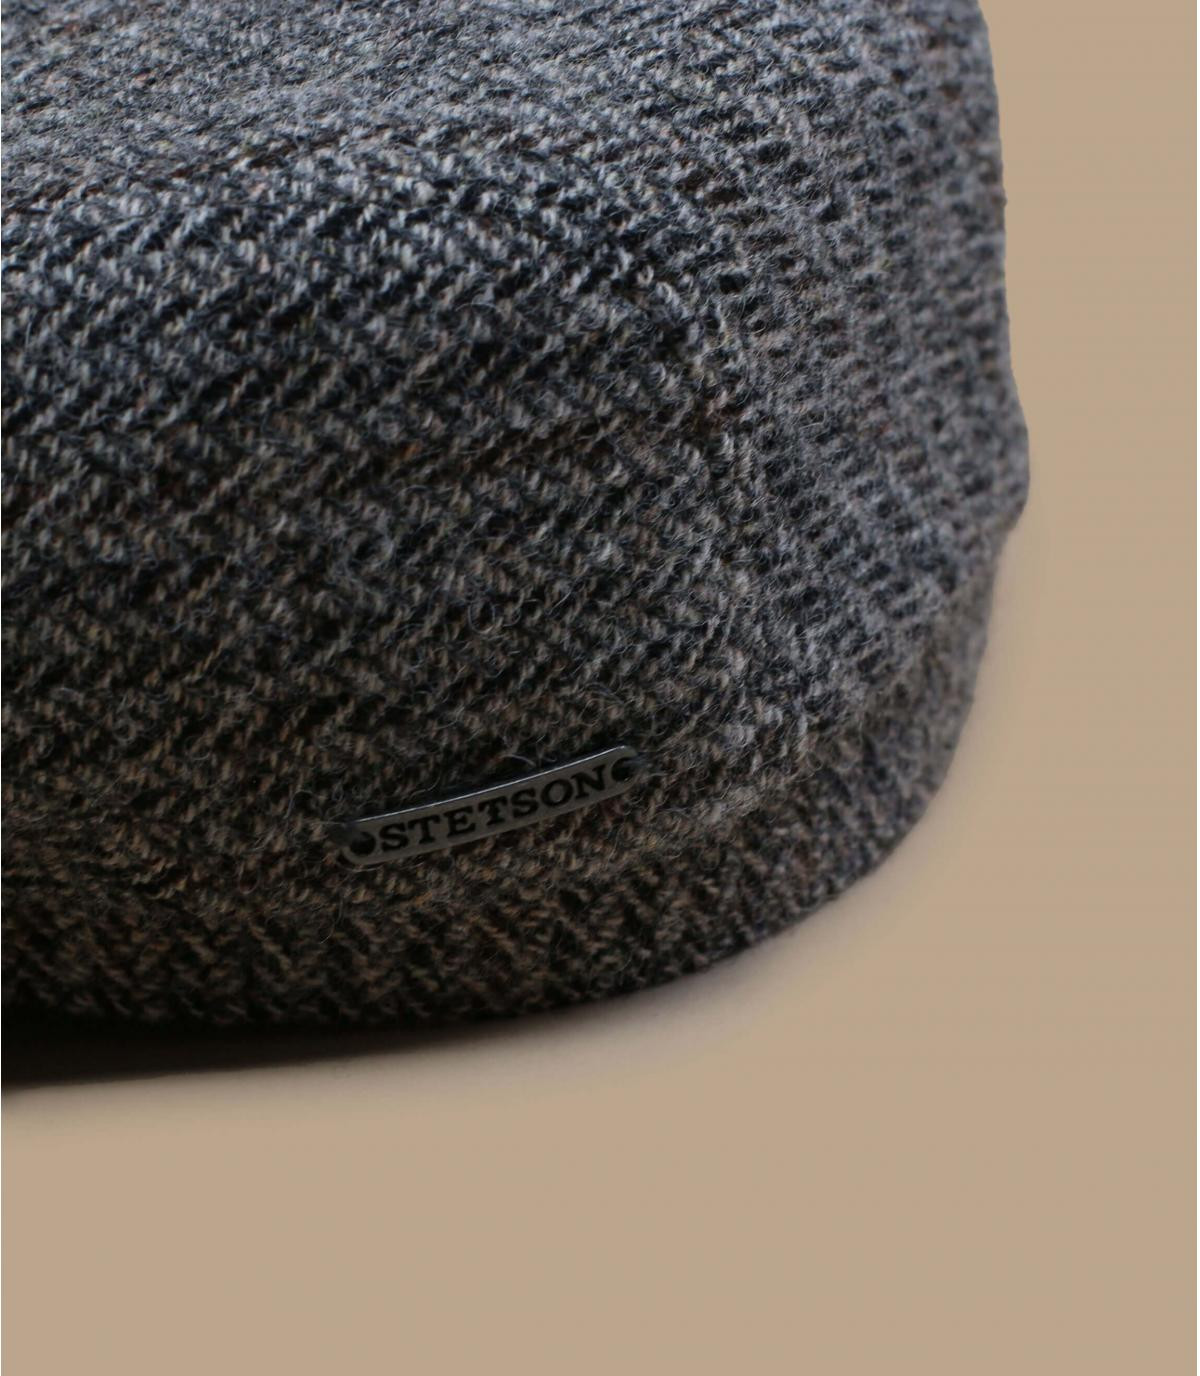 Details Driver Cap Virgin Wool Herringbone grey - Abbildung 2